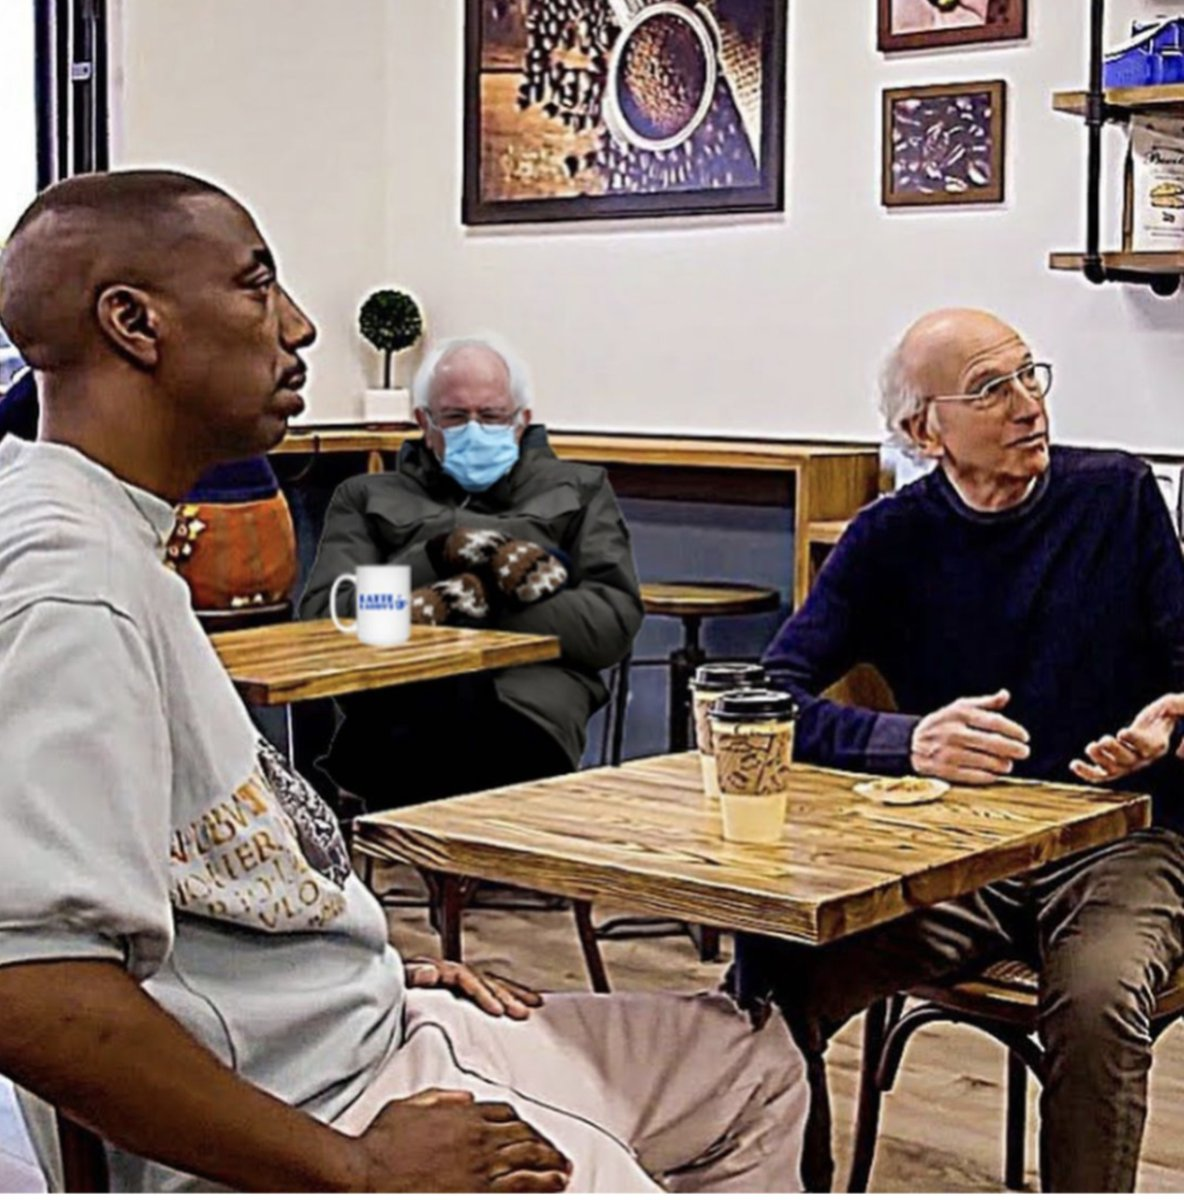 Now I have 3 pain in the asses in Mocha Joe's looking for free coffee. #CurbYourEnthusiasm #mochajoe #Berniememes #coffee #mittens #lattelarry